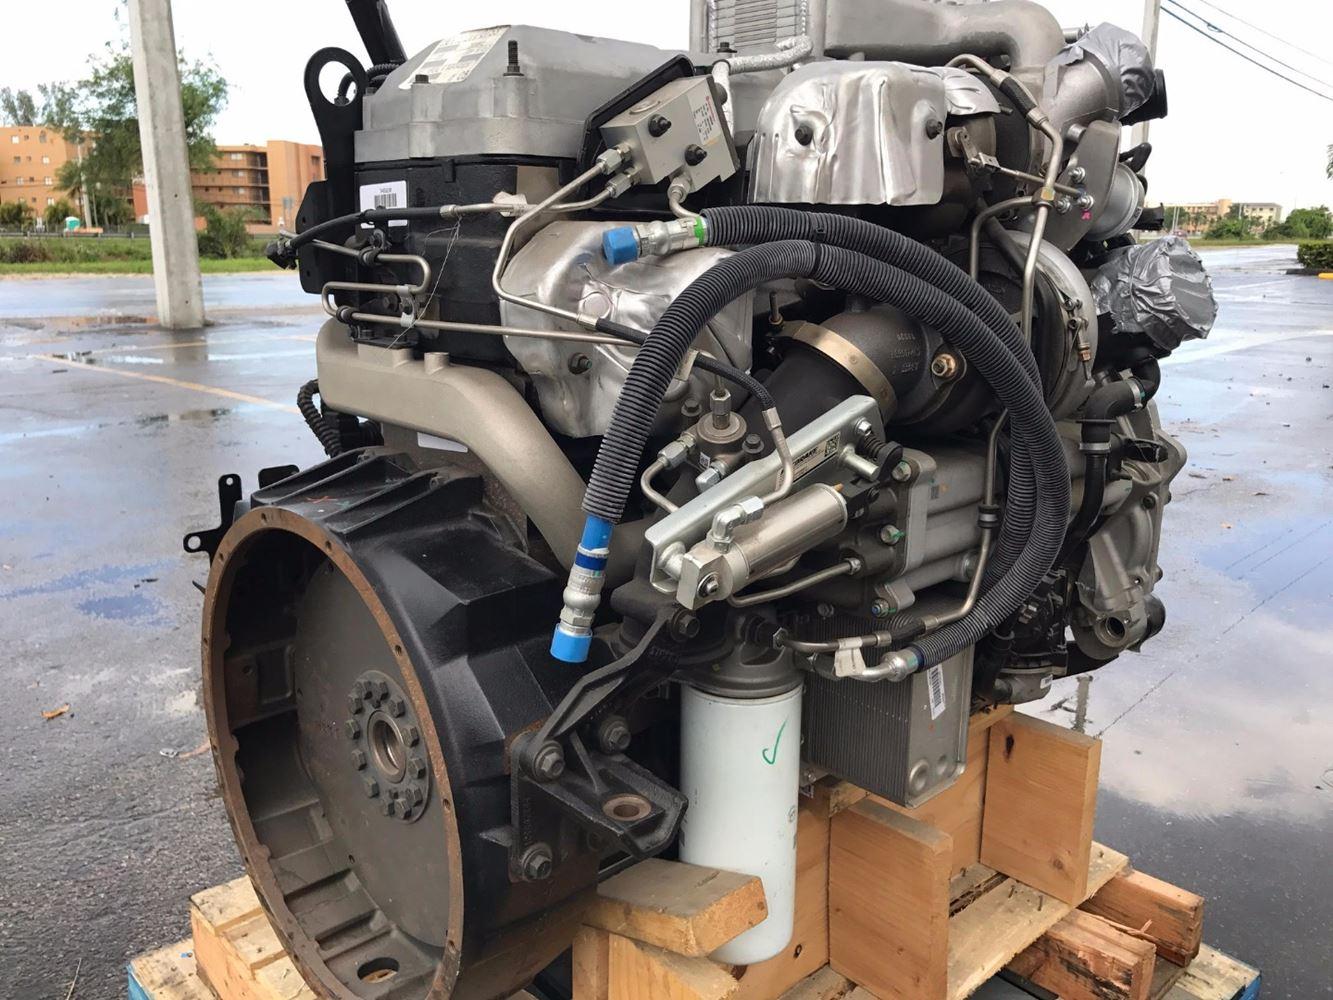 International Maxxforce Engine Assys Rbkofish Apw F